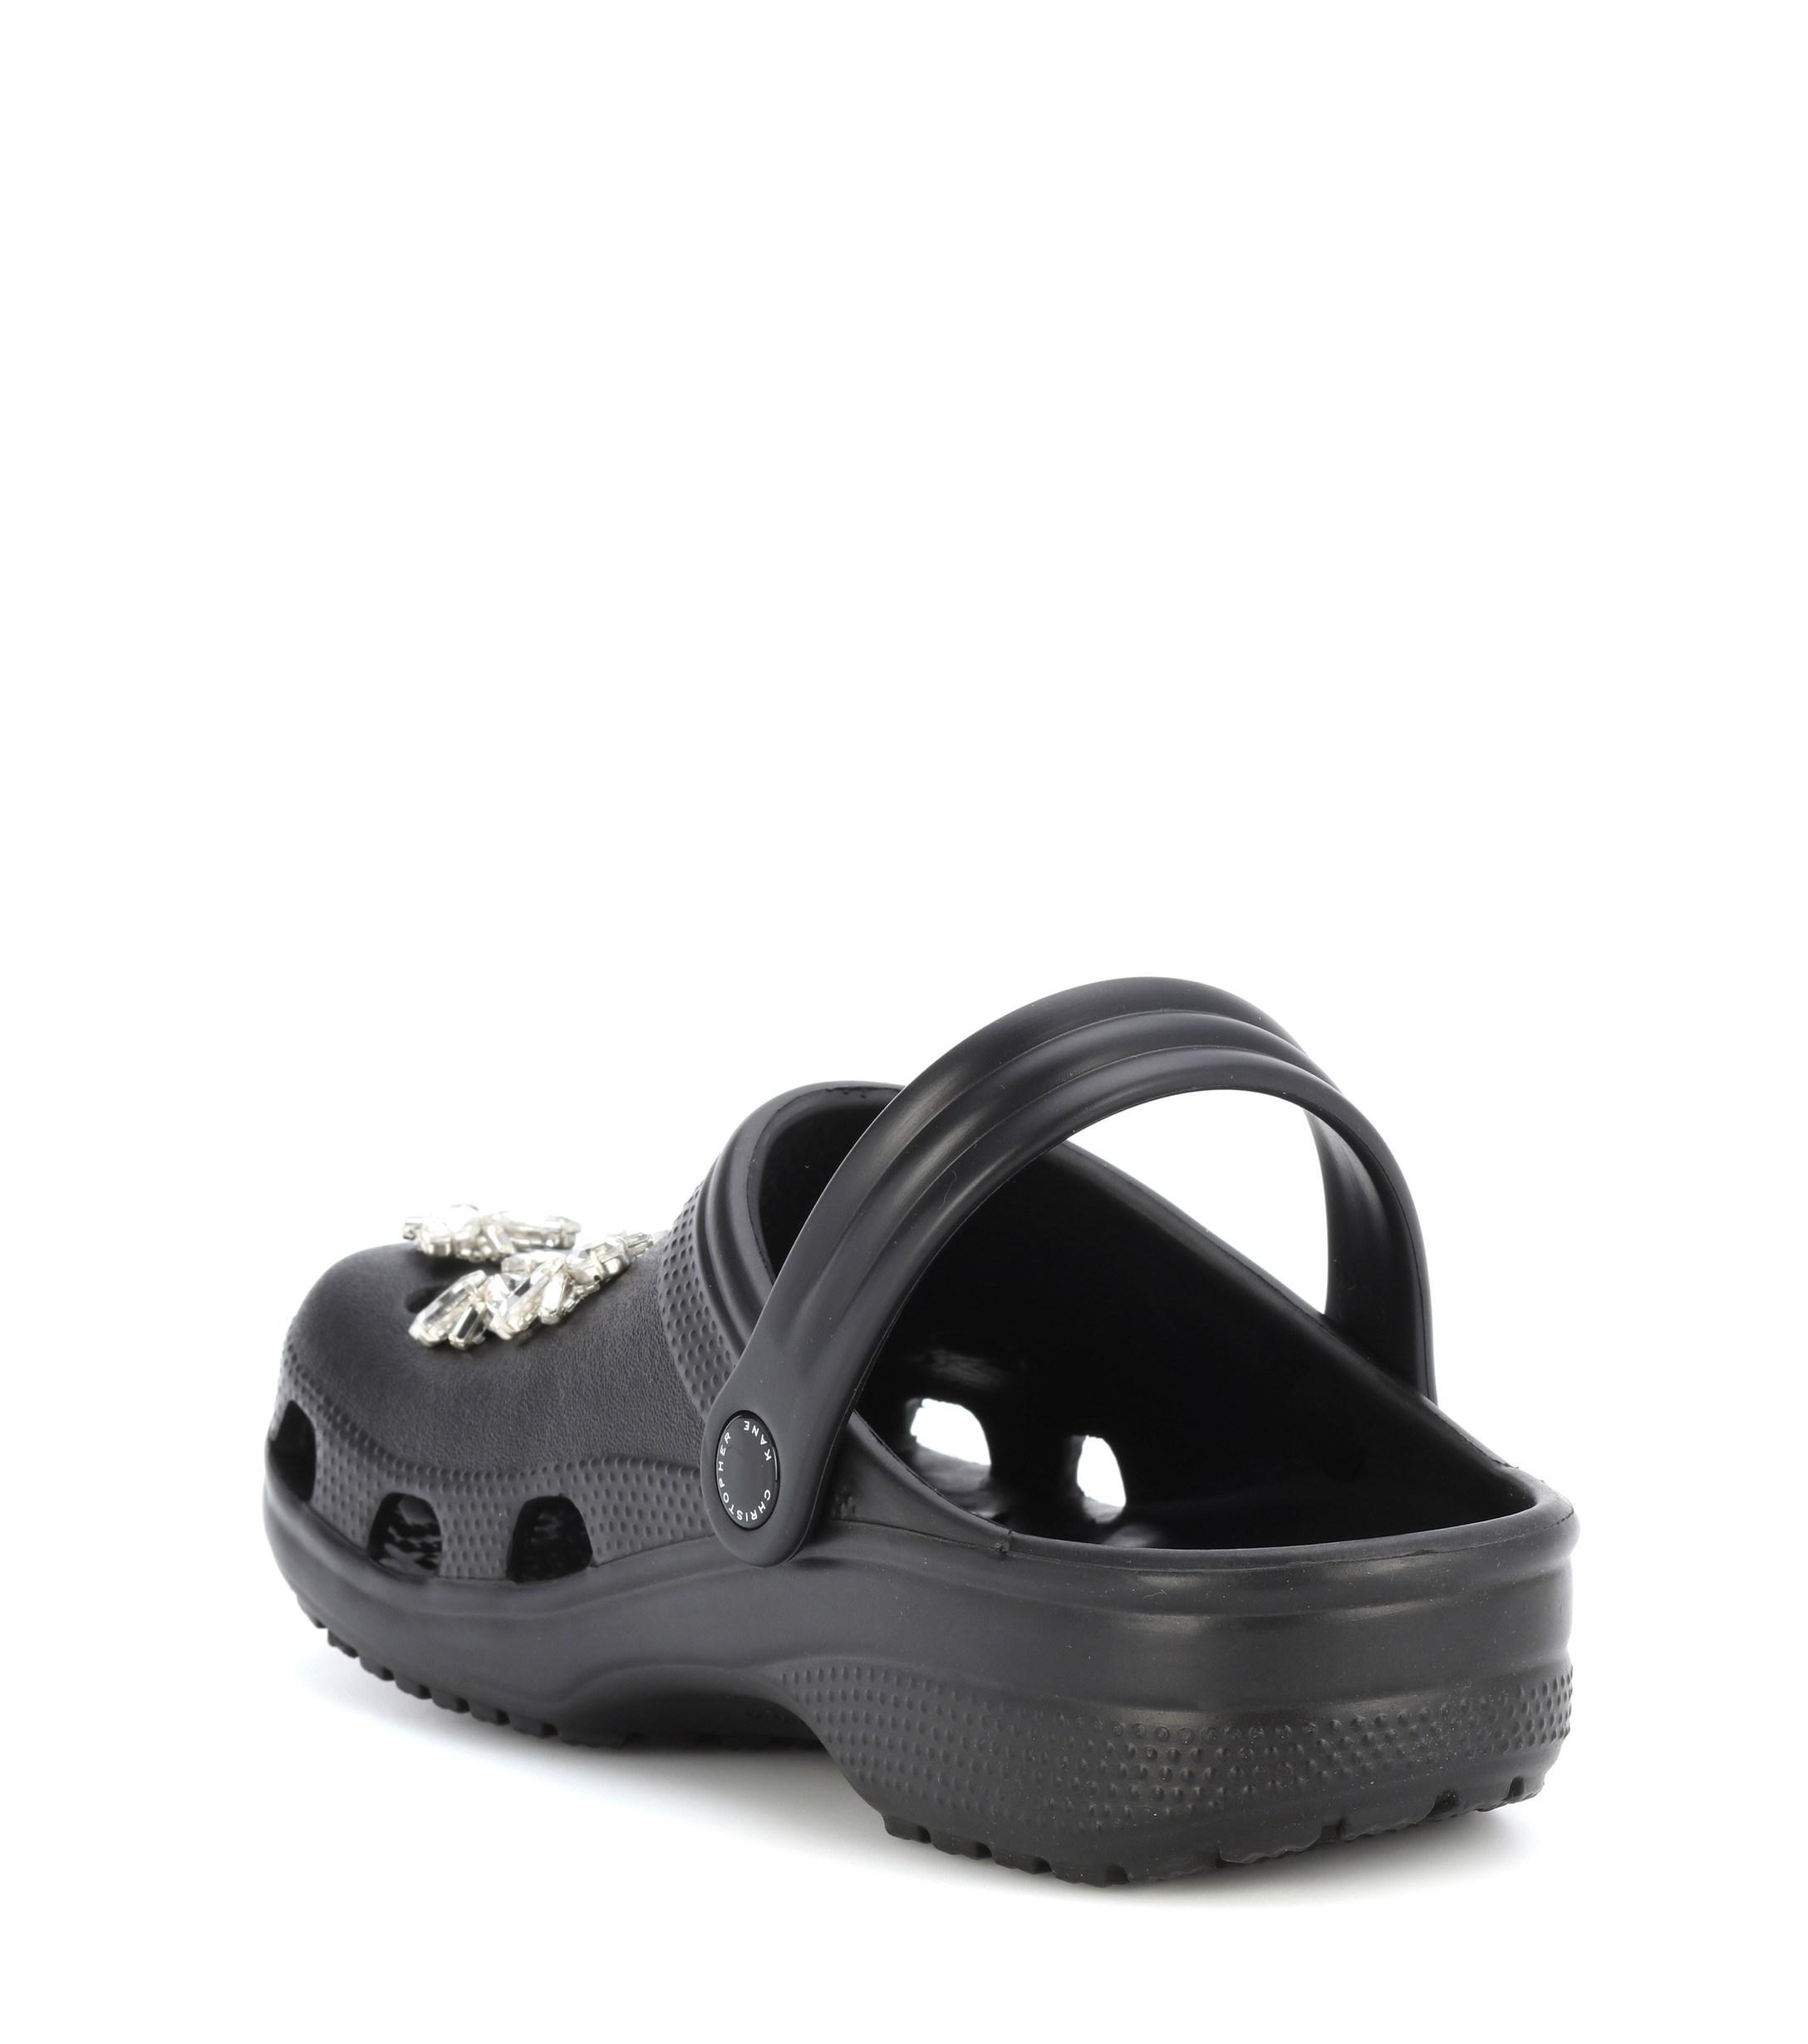 971c951405f6c Christopher Kane - Black Crystal-embellished Crocs - Lyst. View fullscreen